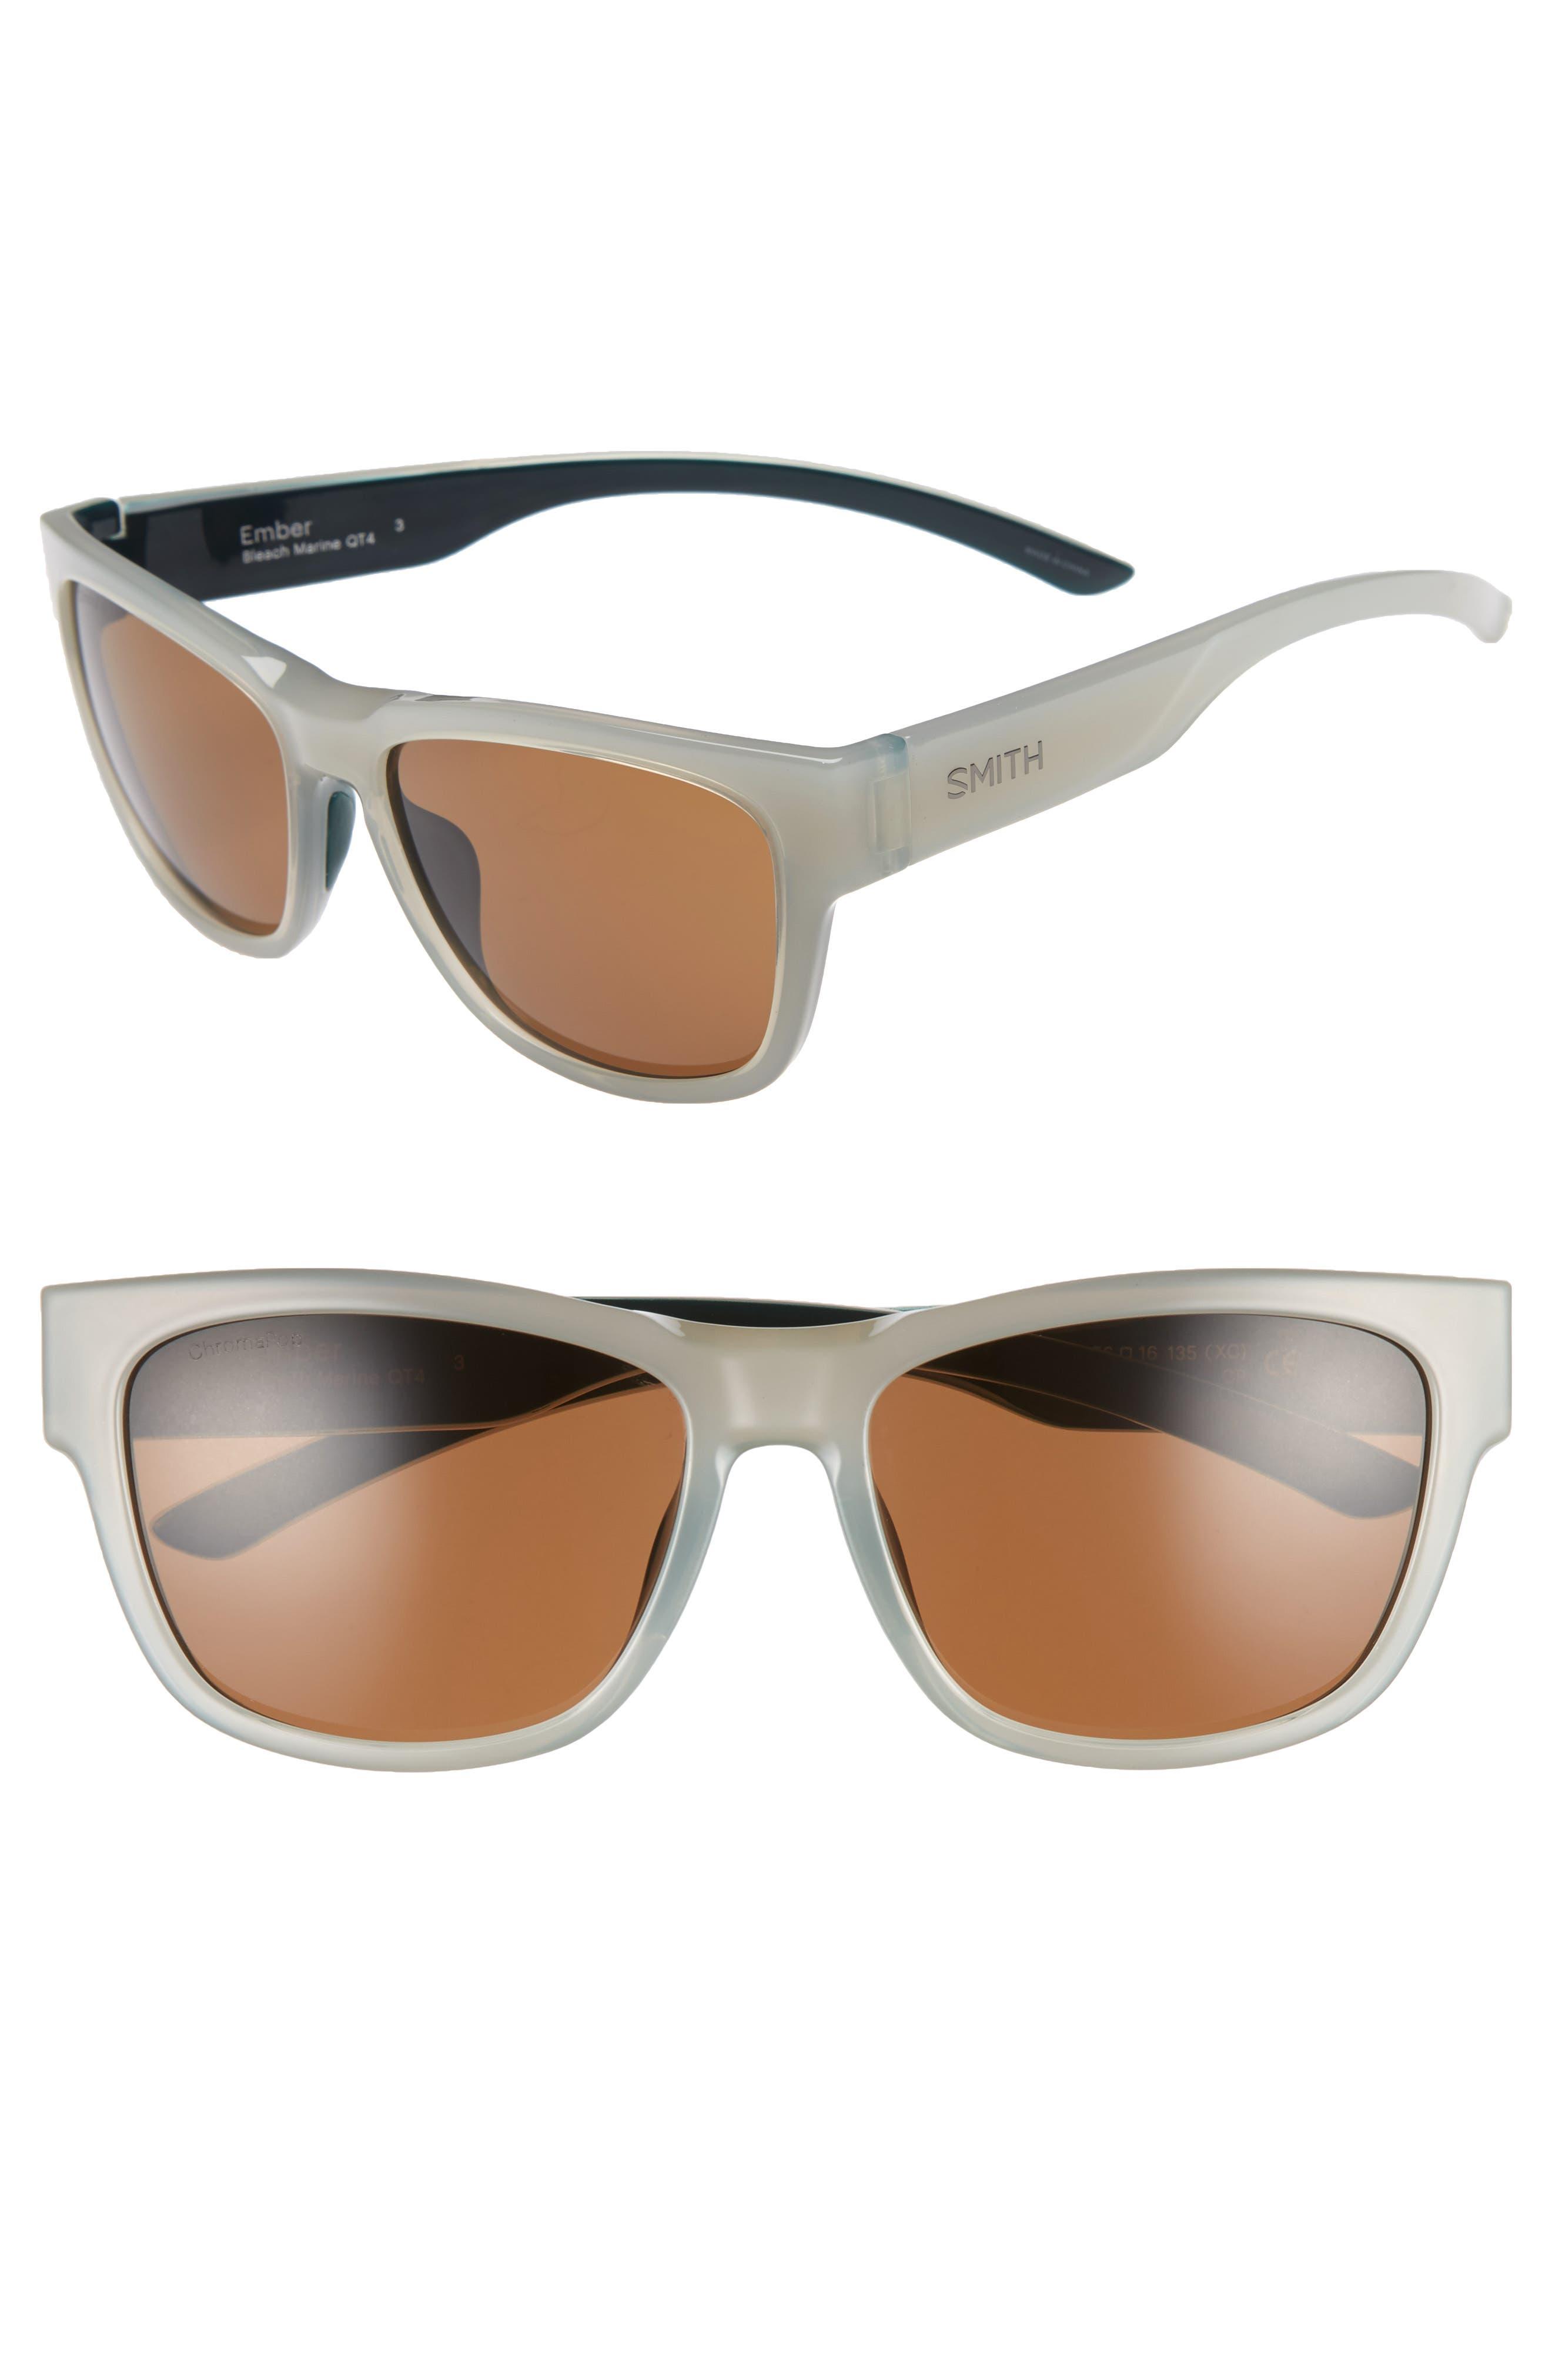 Ember 52mm ChromaPop<sup>™</sup> Sunglasses,                             Main thumbnail 1, color,                             Bleach Marine